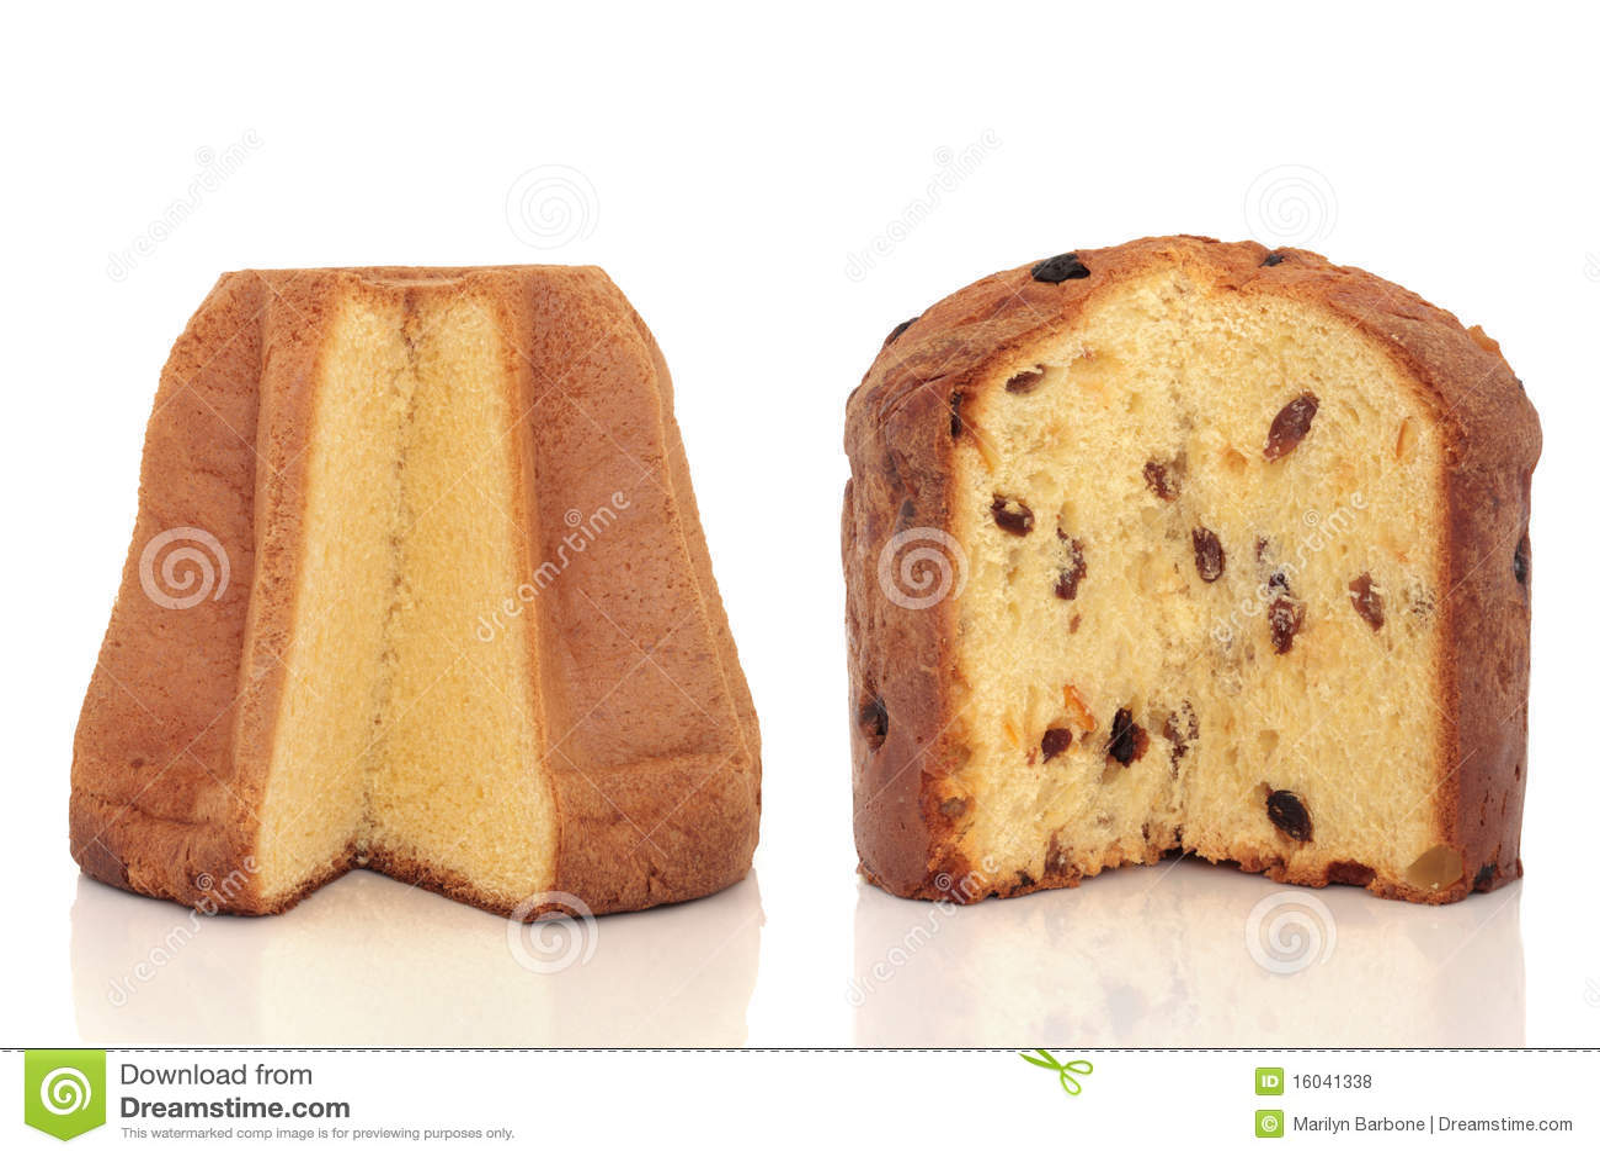 Pandoro And Panettone Cakes Royalty Free Stock Photos ...